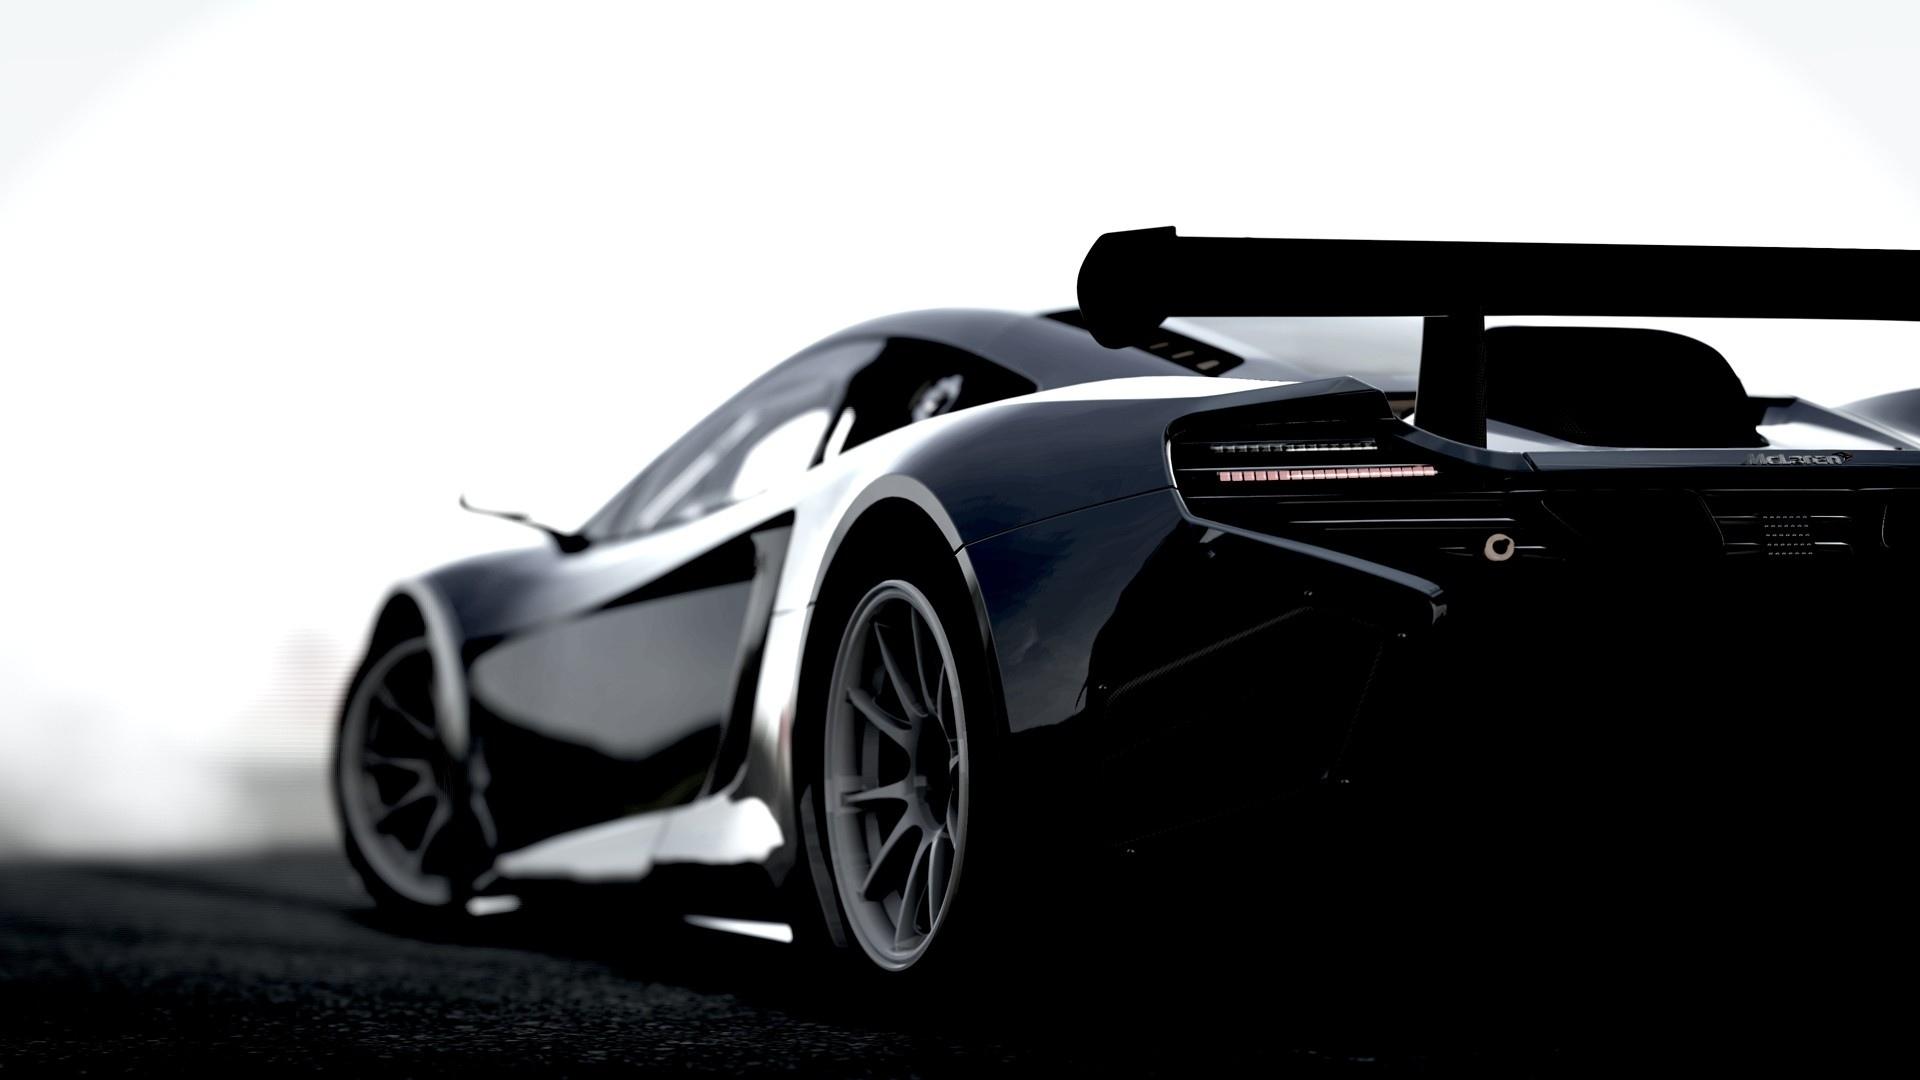 Motorsports; Motorsports Wallpaper; Motorsports Wallpaper; Motorsports Wallpaper; Motorsports Wallpaper ...